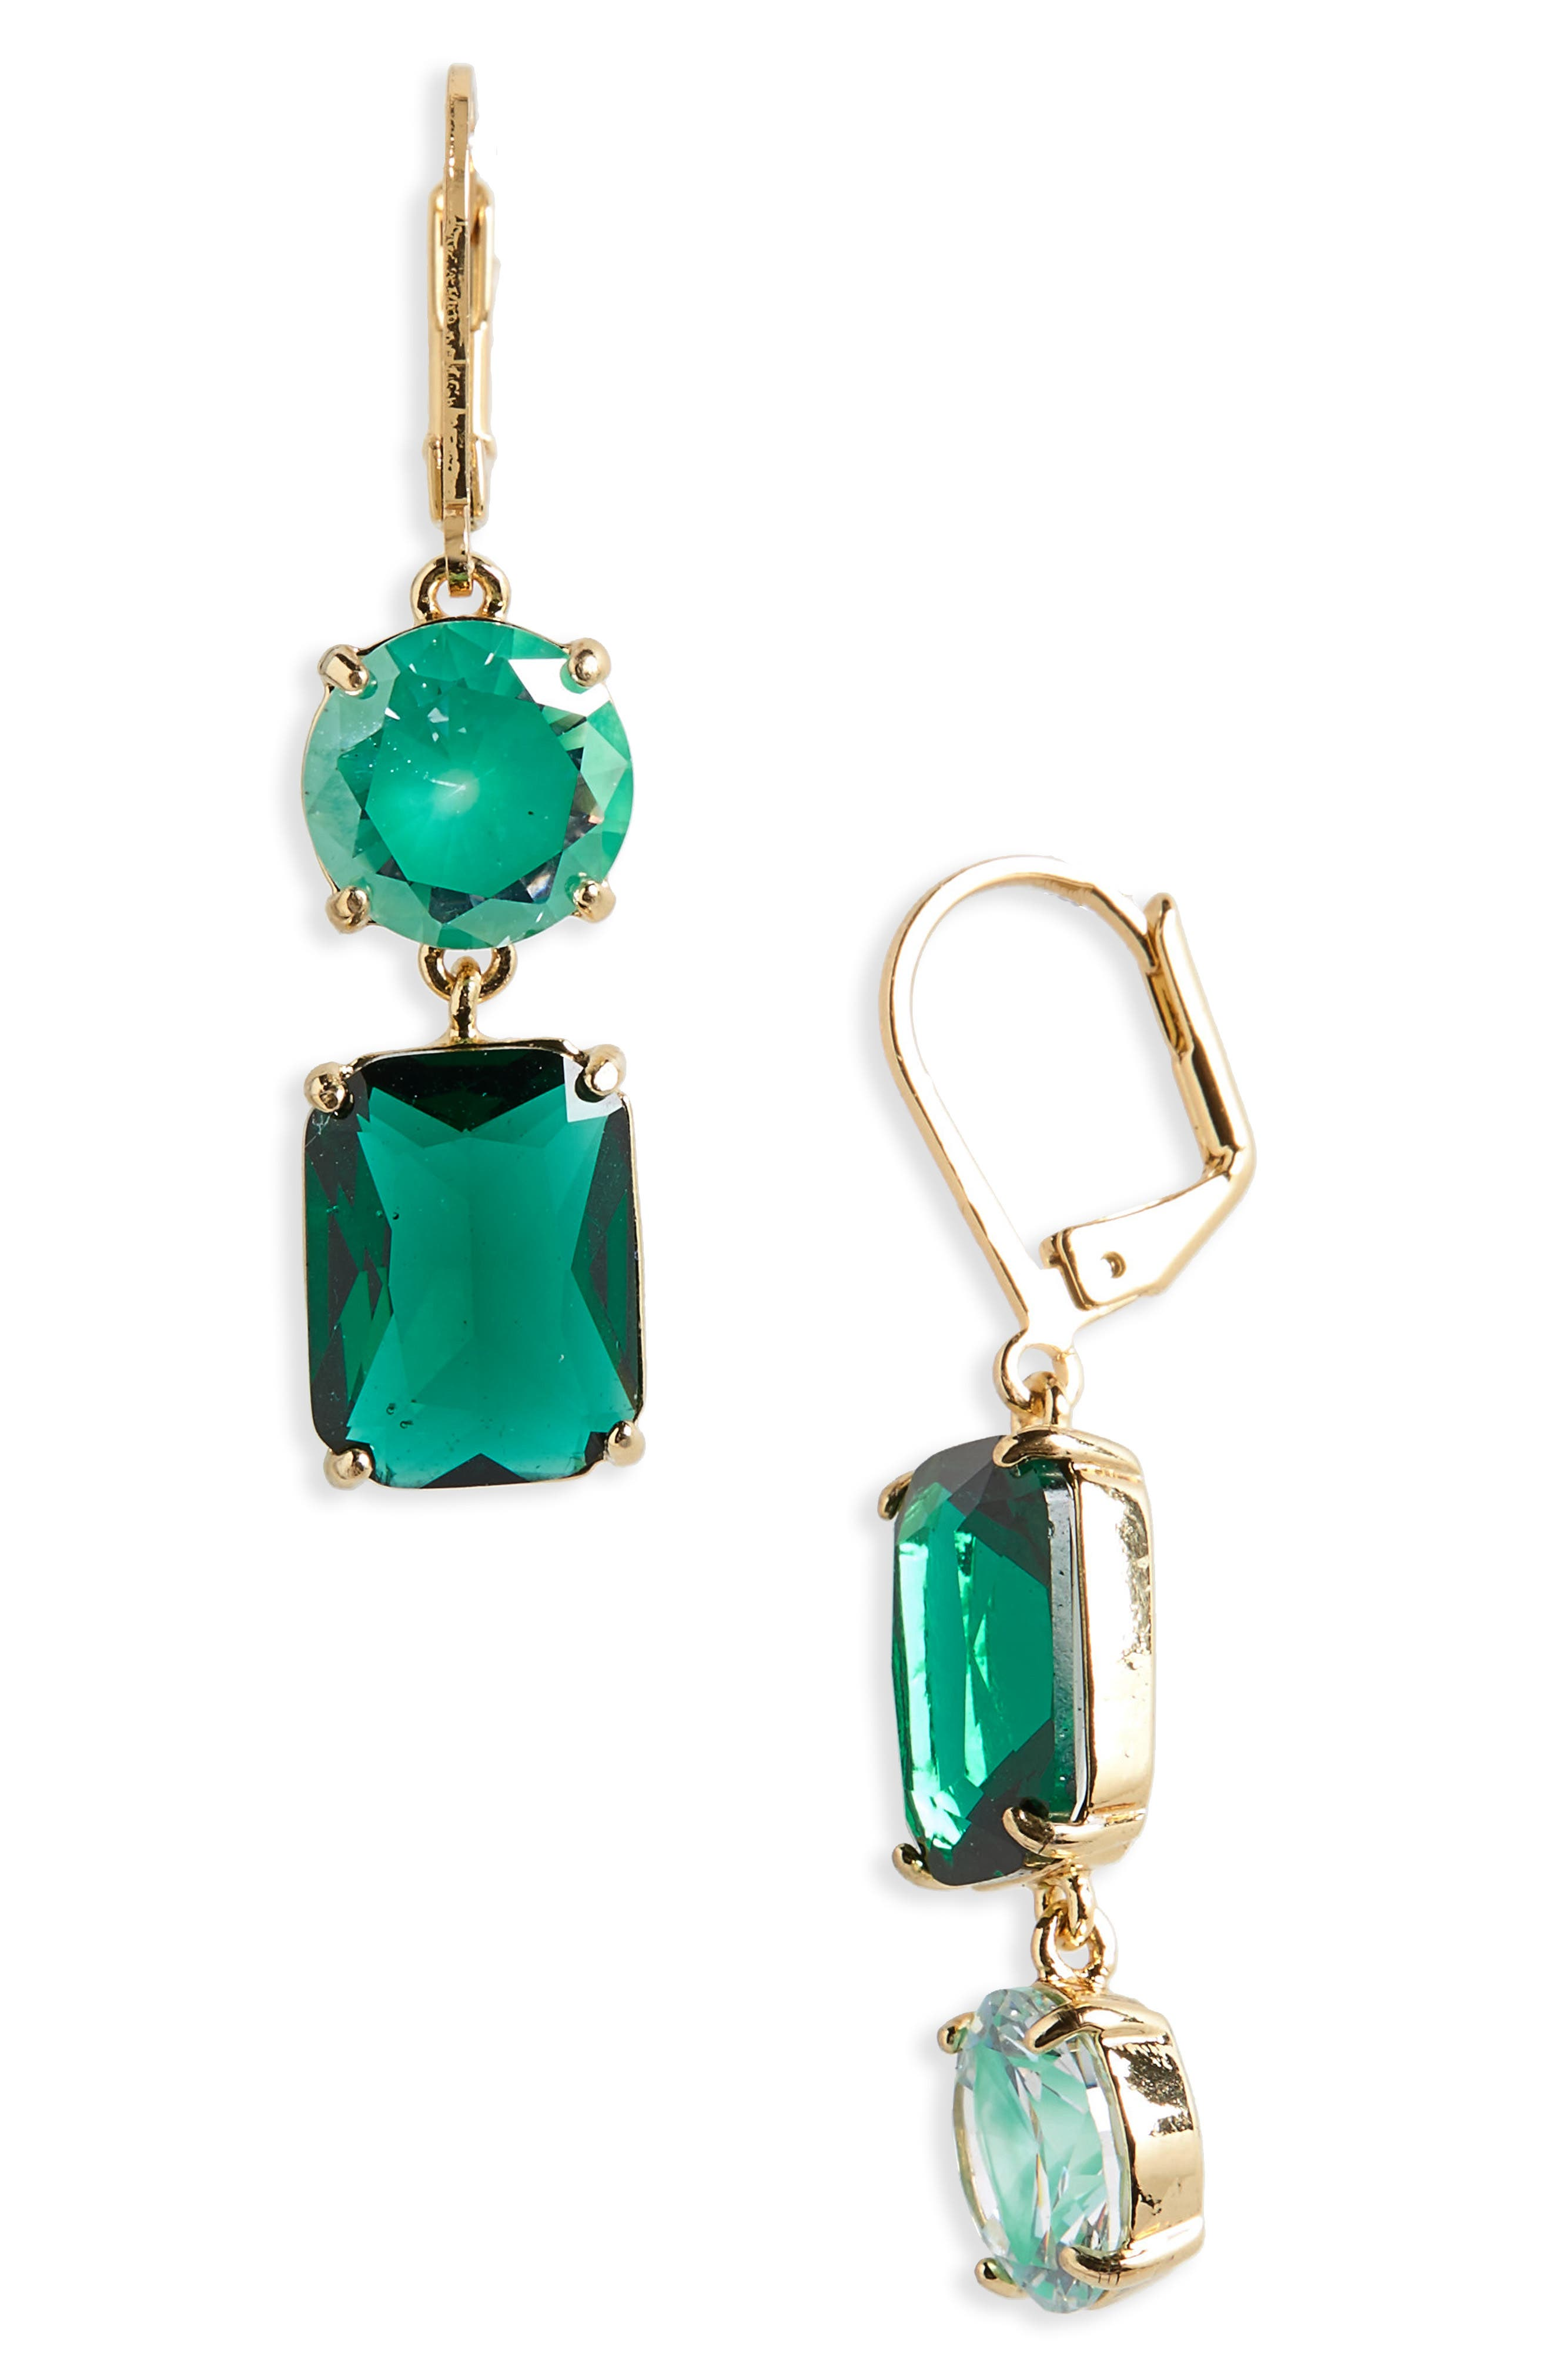 KATE SPADE NEW YORK,                             kate spade shine on mismatched drop earrings,                             Main thumbnail 1, color,                             300